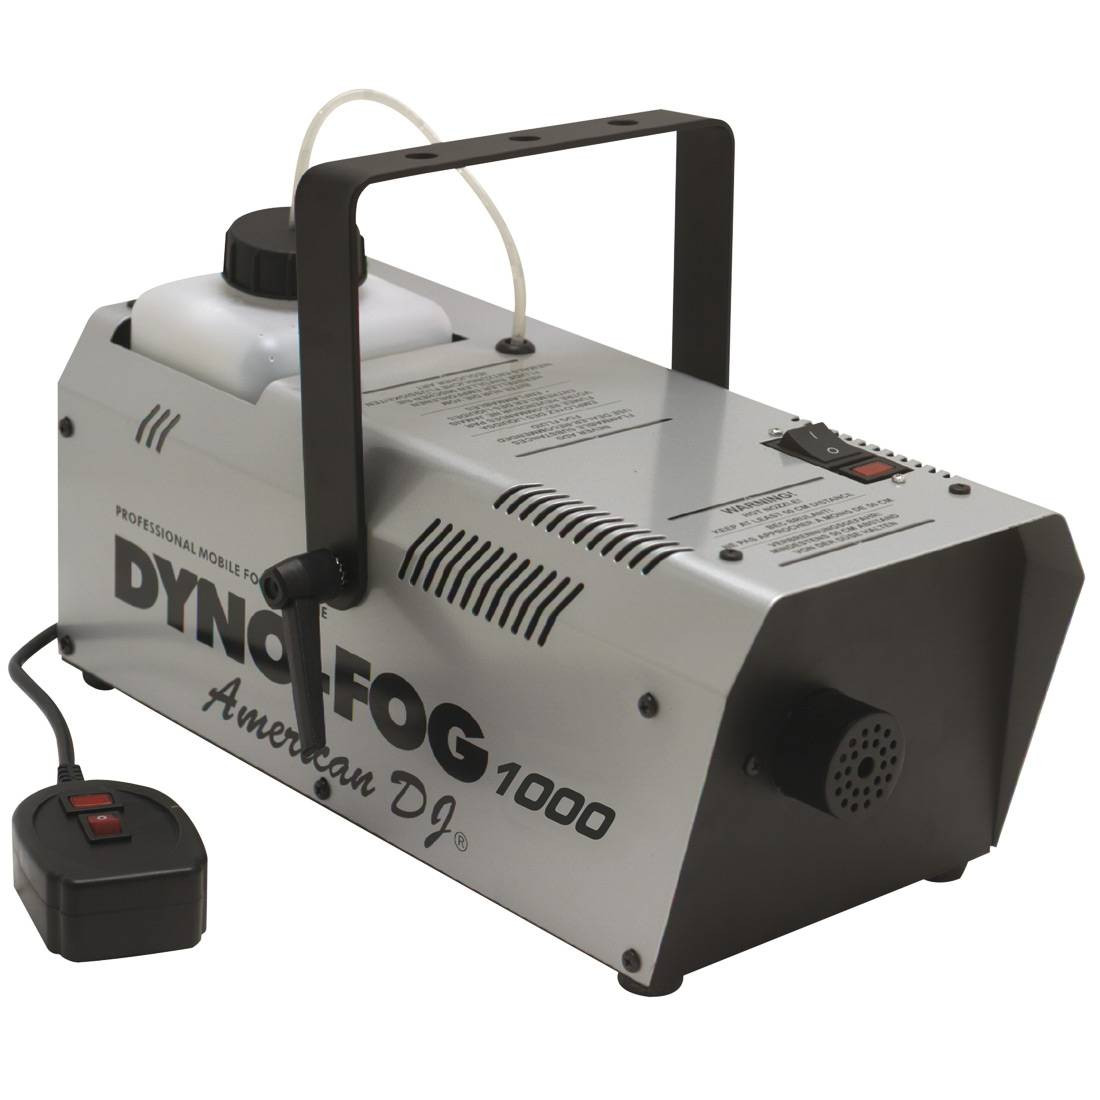 Ремонт AMERICAN DJ SUPPLY DYNOFOG 1000